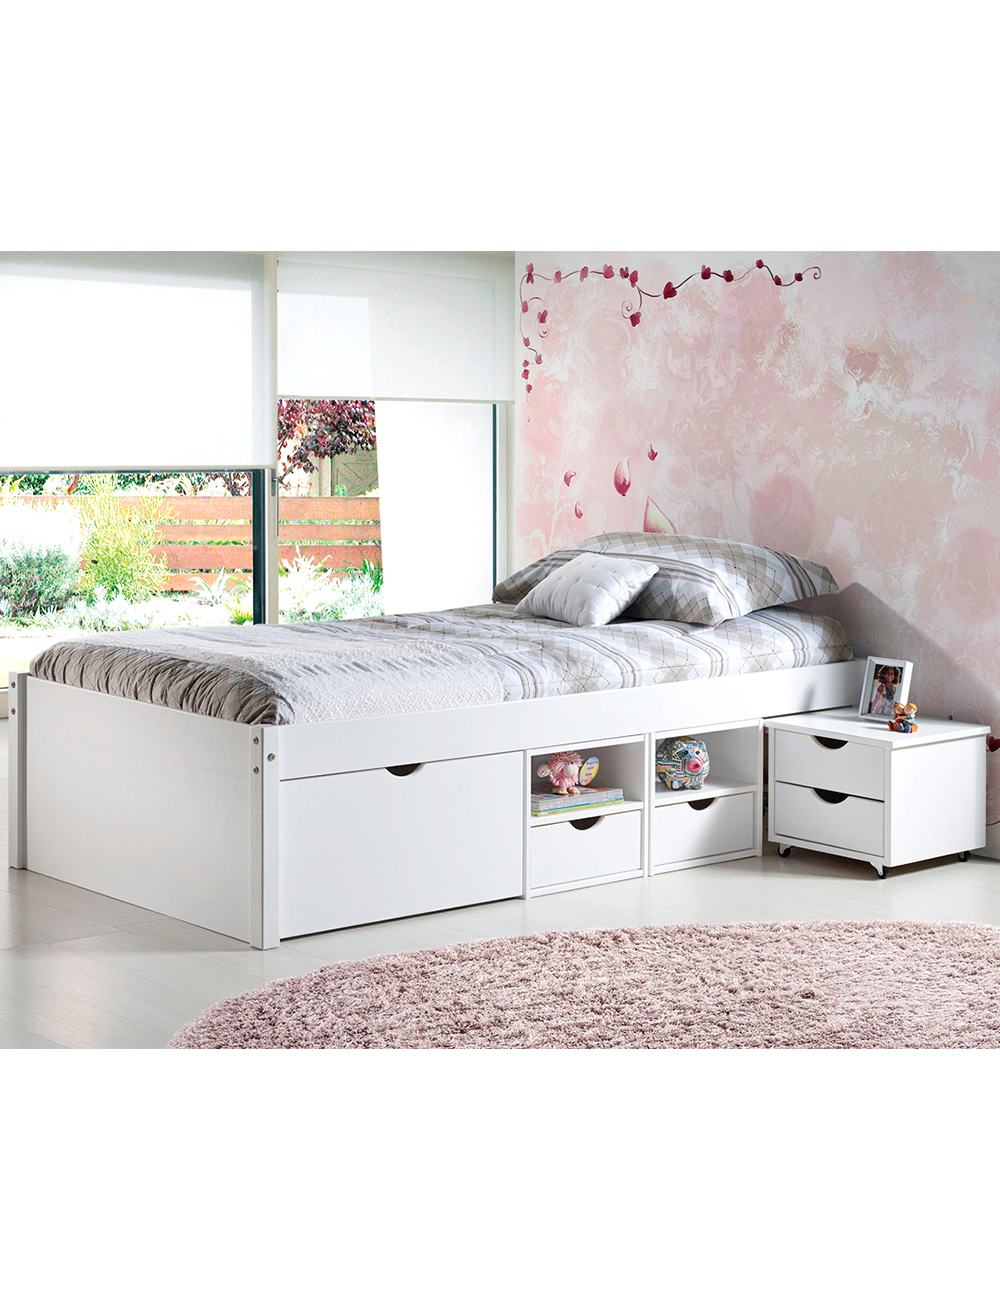 lit multi rangement en pin massif teint blanc 90 x 200 cm. Black Bedroom Furniture Sets. Home Design Ideas